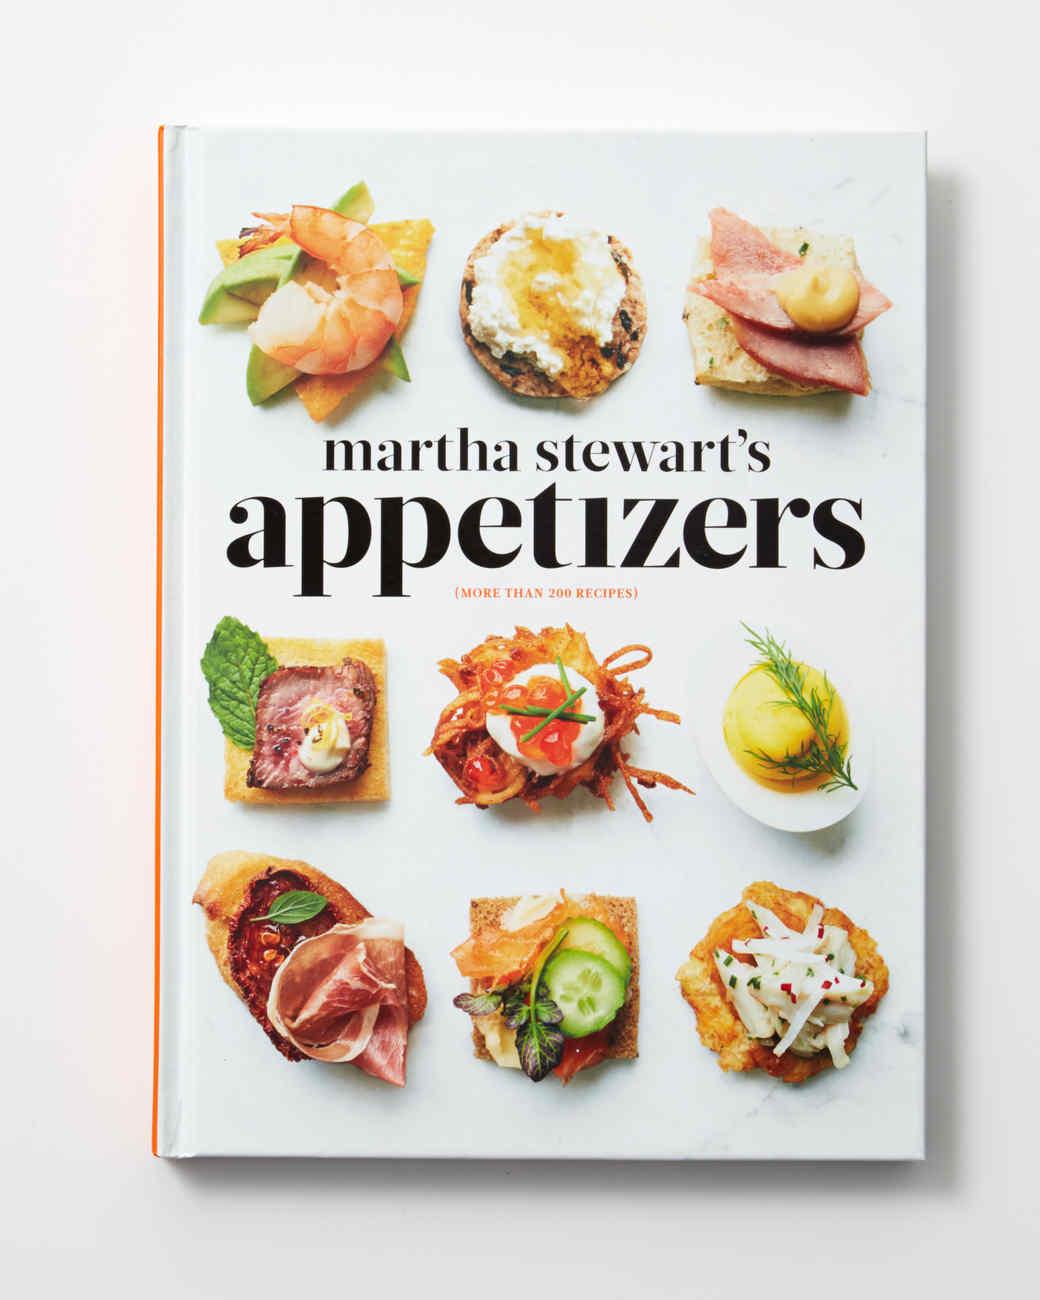 food-cookbook-2997-d112789-0116.jpg